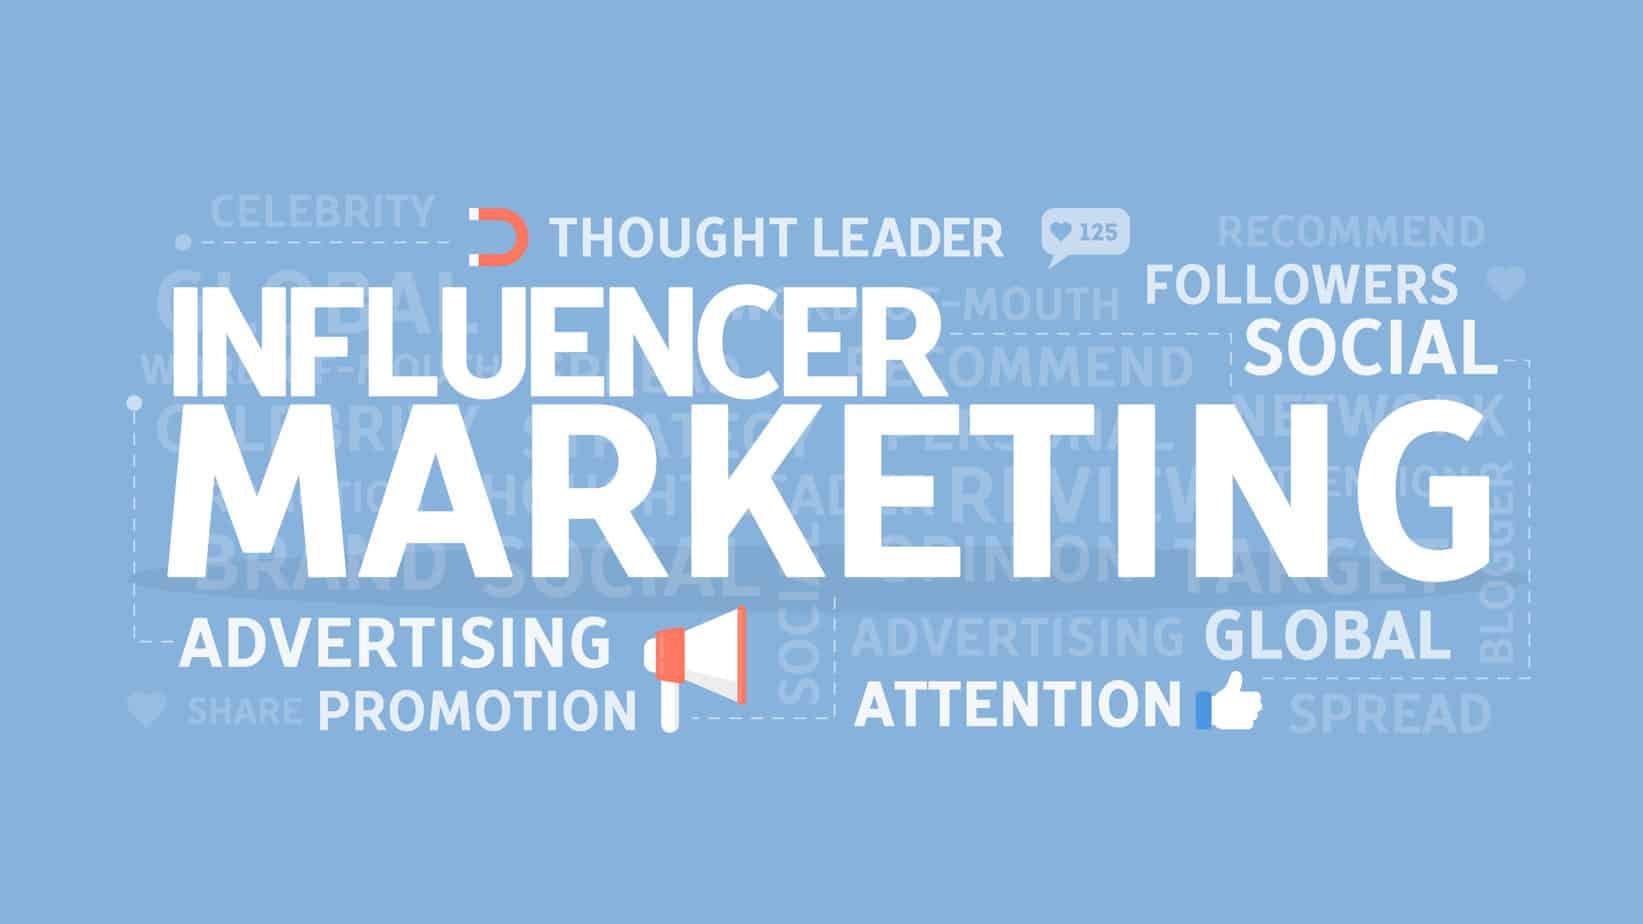 Influencer Marketing word collage